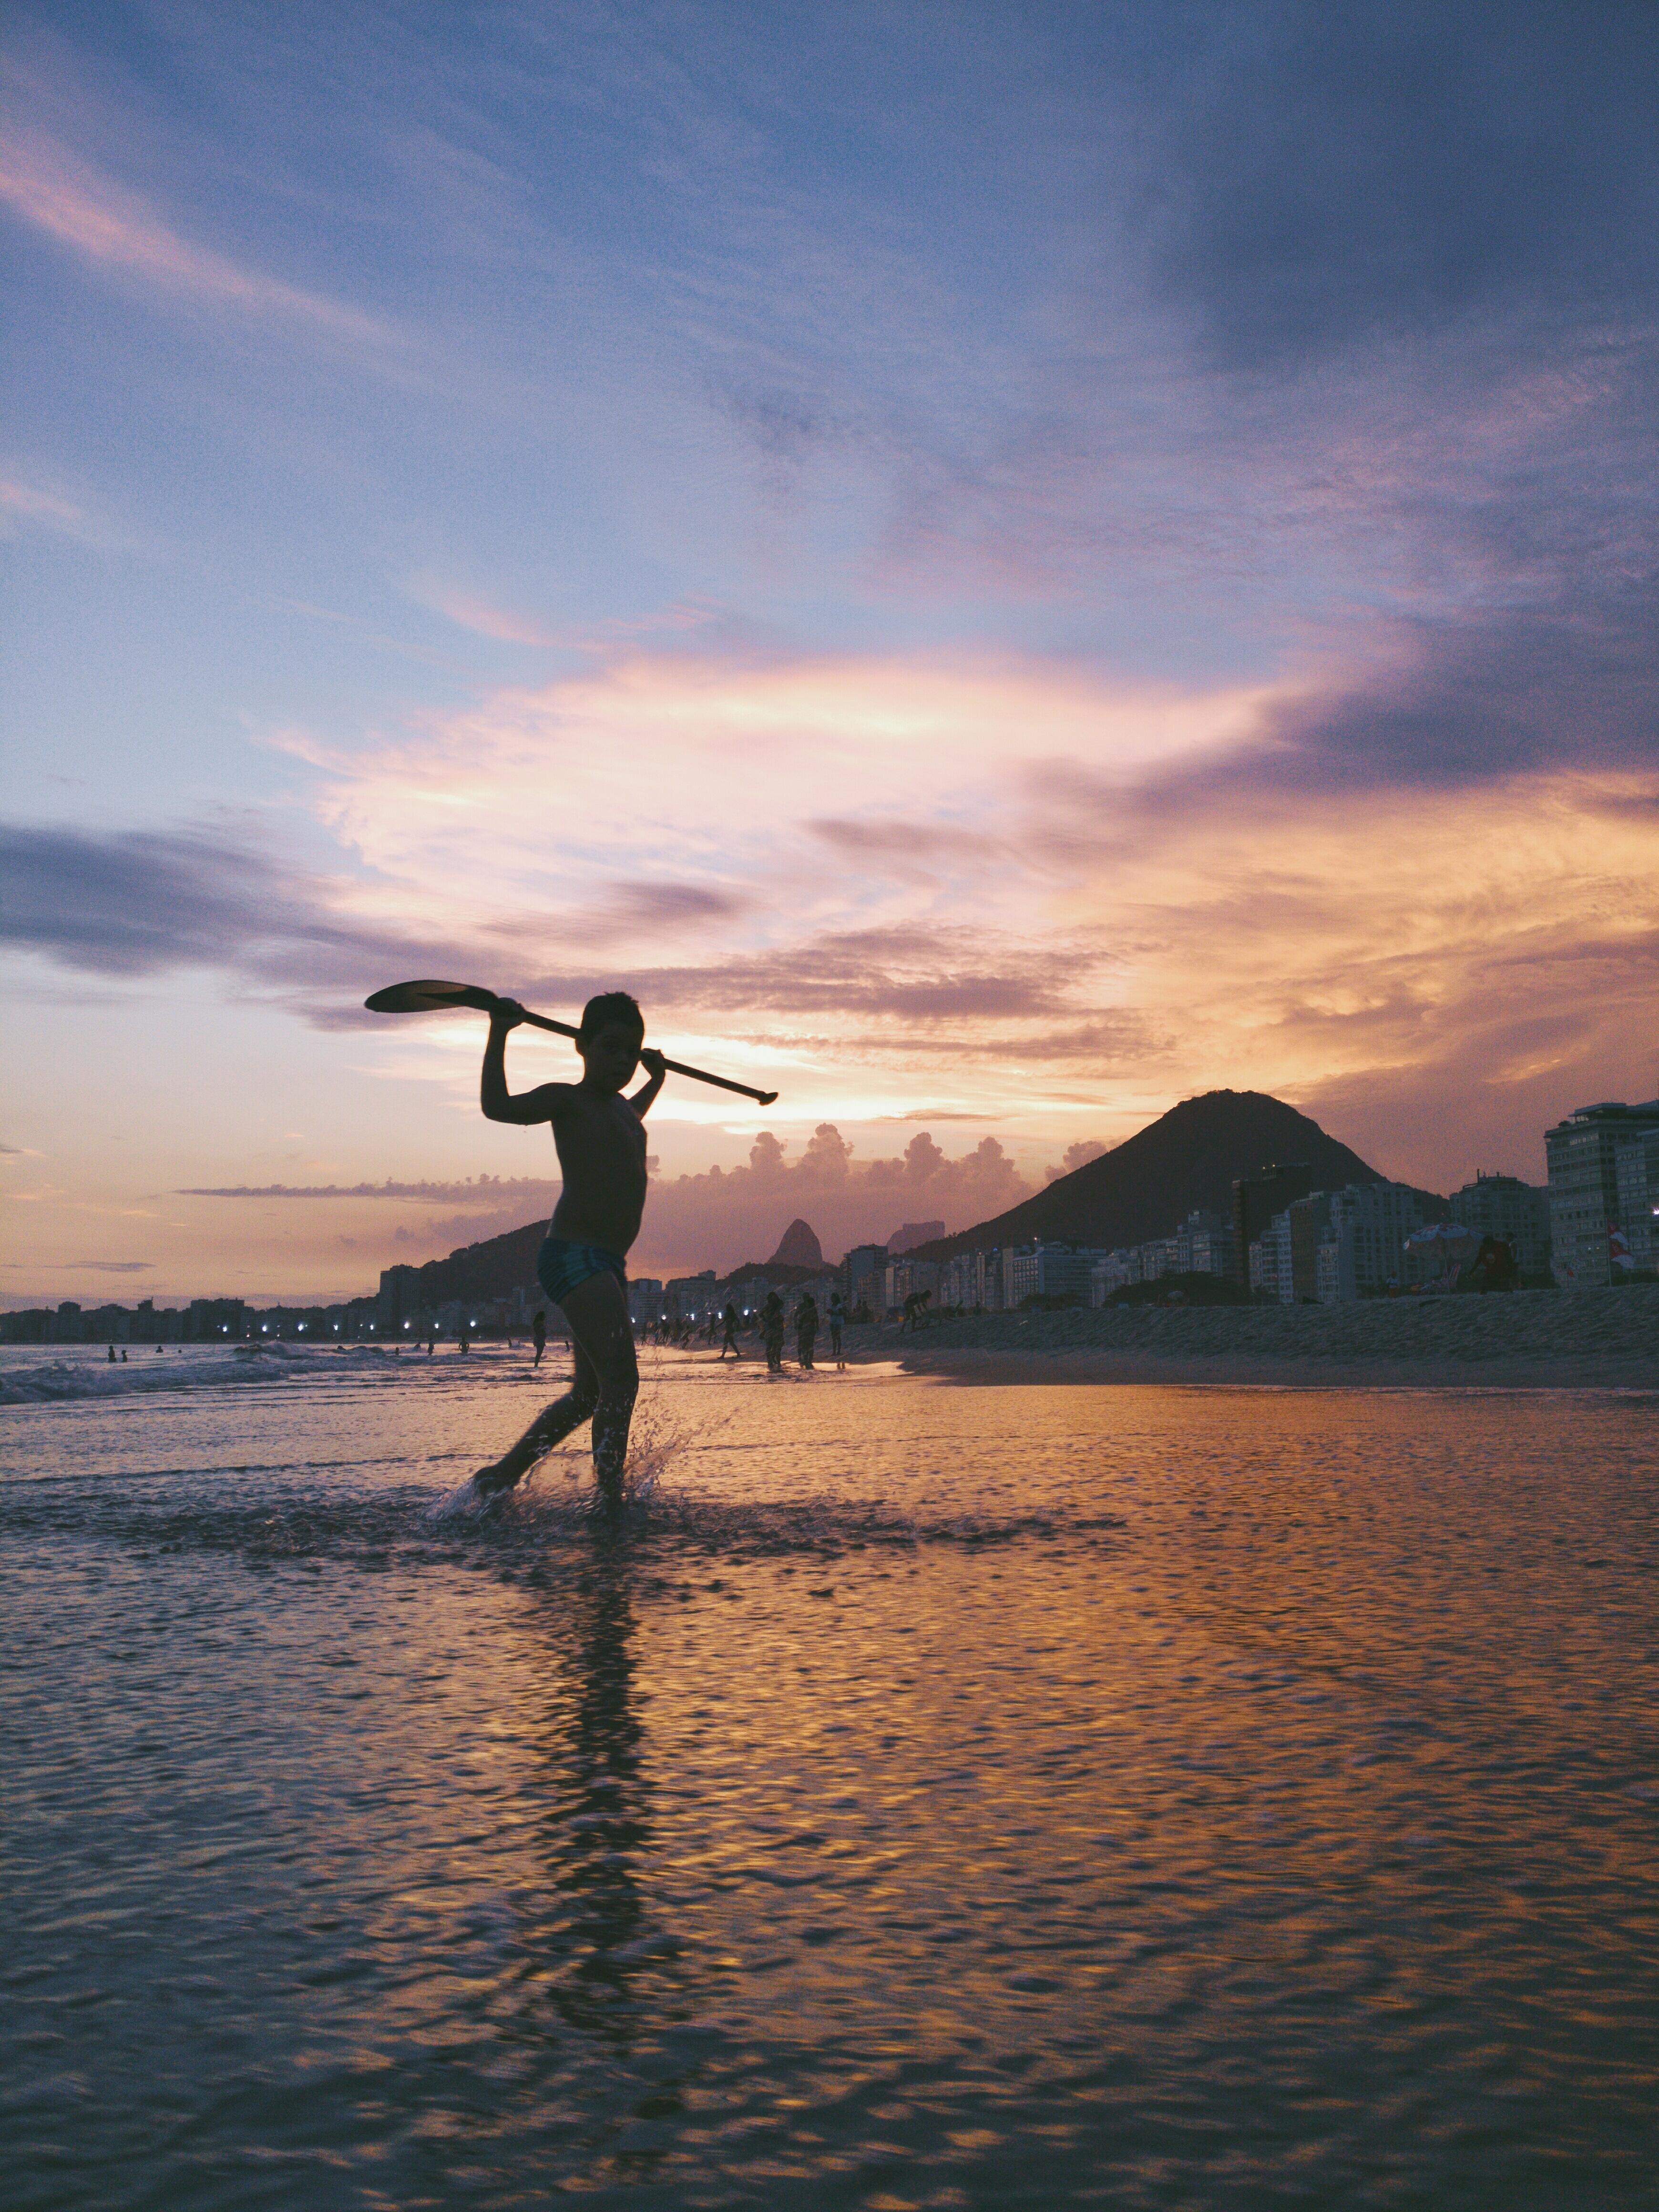 Waterboy--OnePlus3T---Copacabana-beach,-Rio-de-Janeiro.jpg